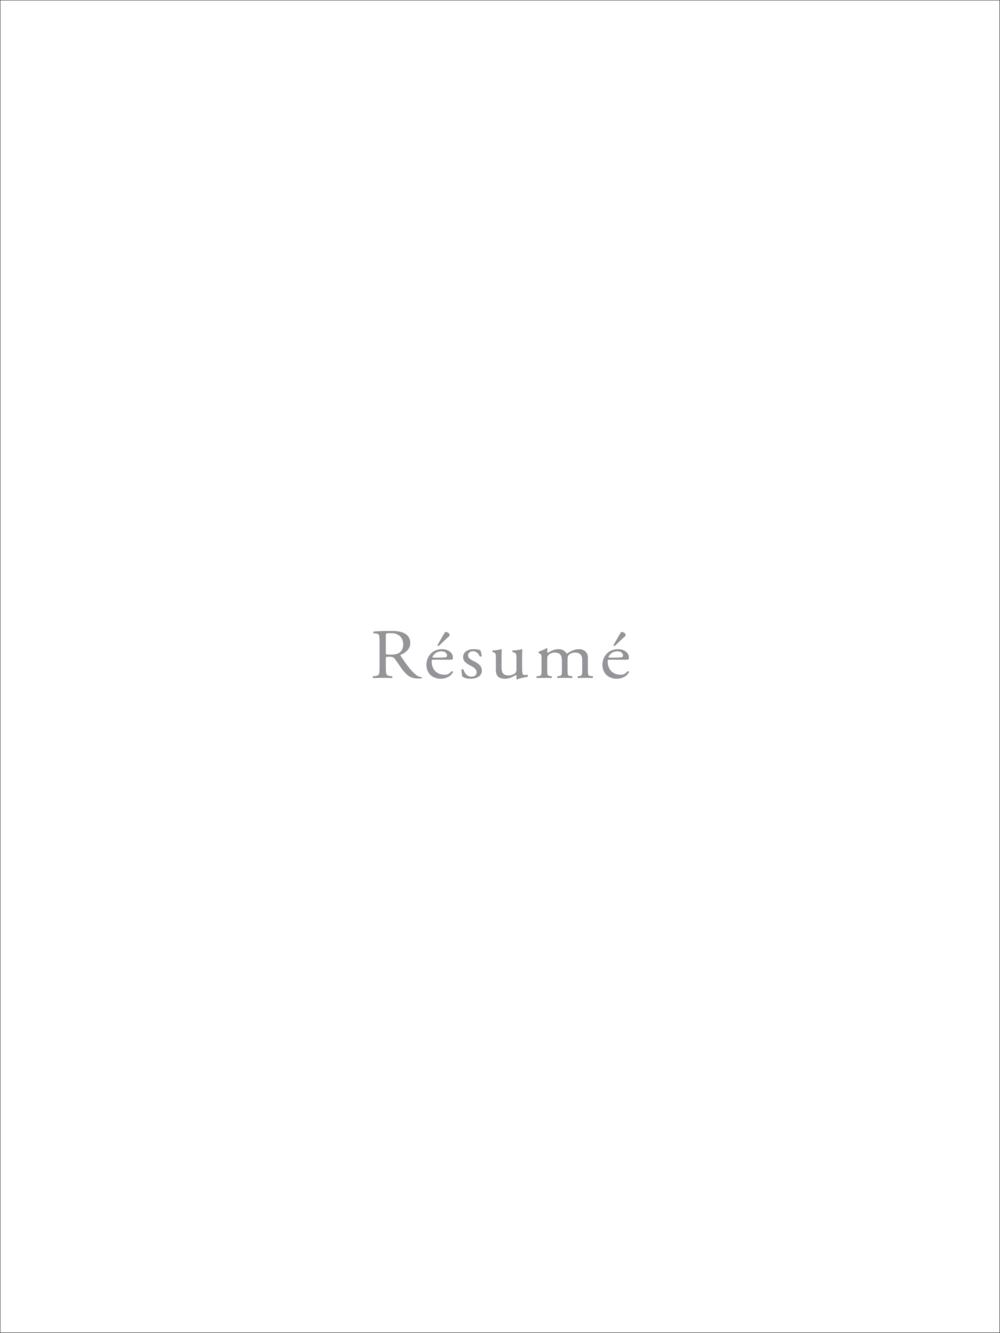 resume image-01.png